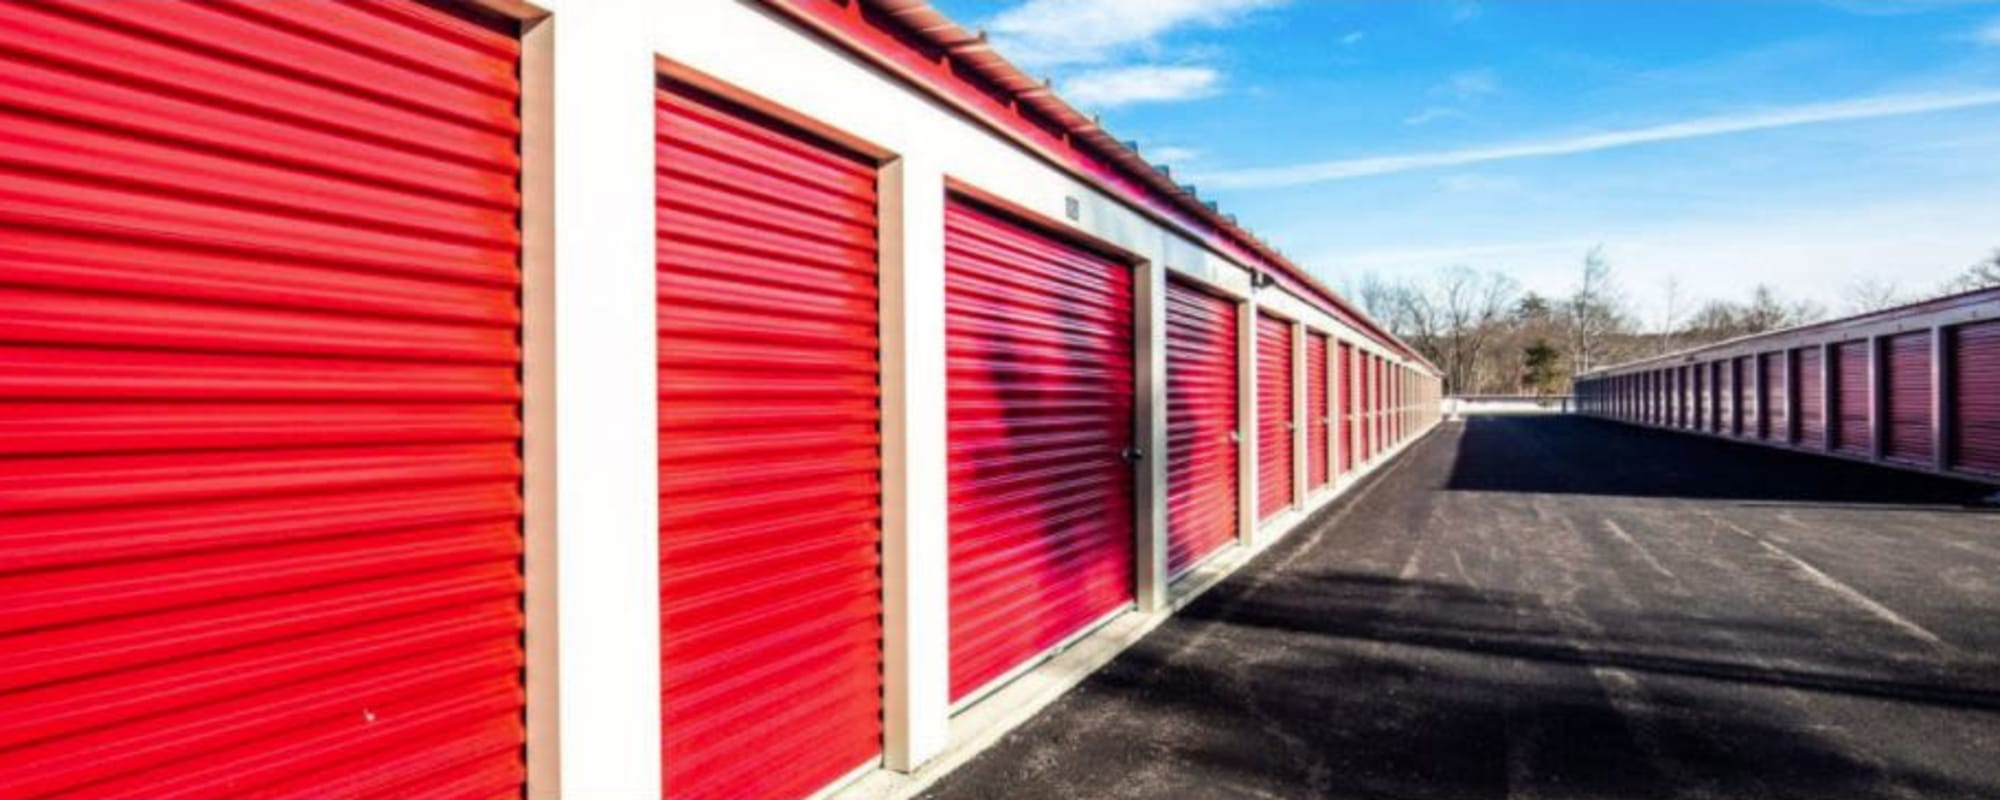 603 Storage - Pittsfield self storage in Pittsfield, New Hampshire